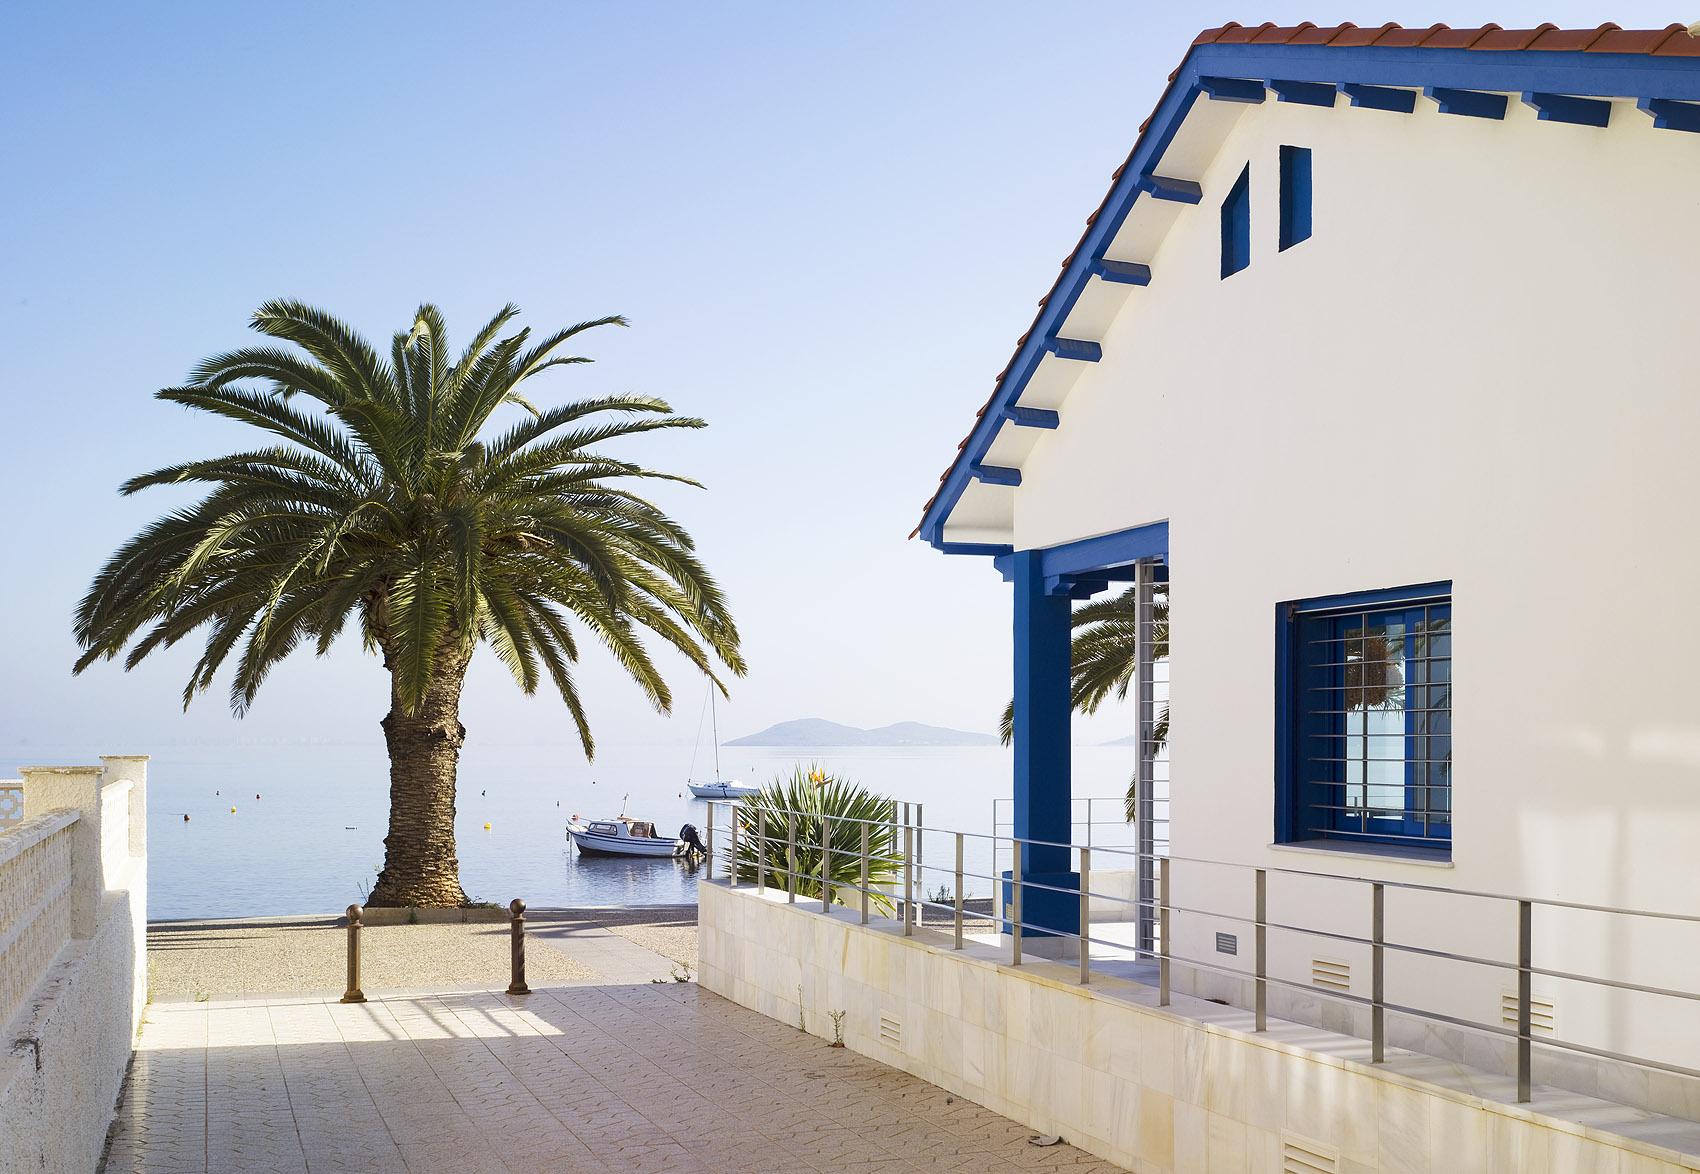 Marcaser - casa de punta_Brava_Teresica frente a la playa